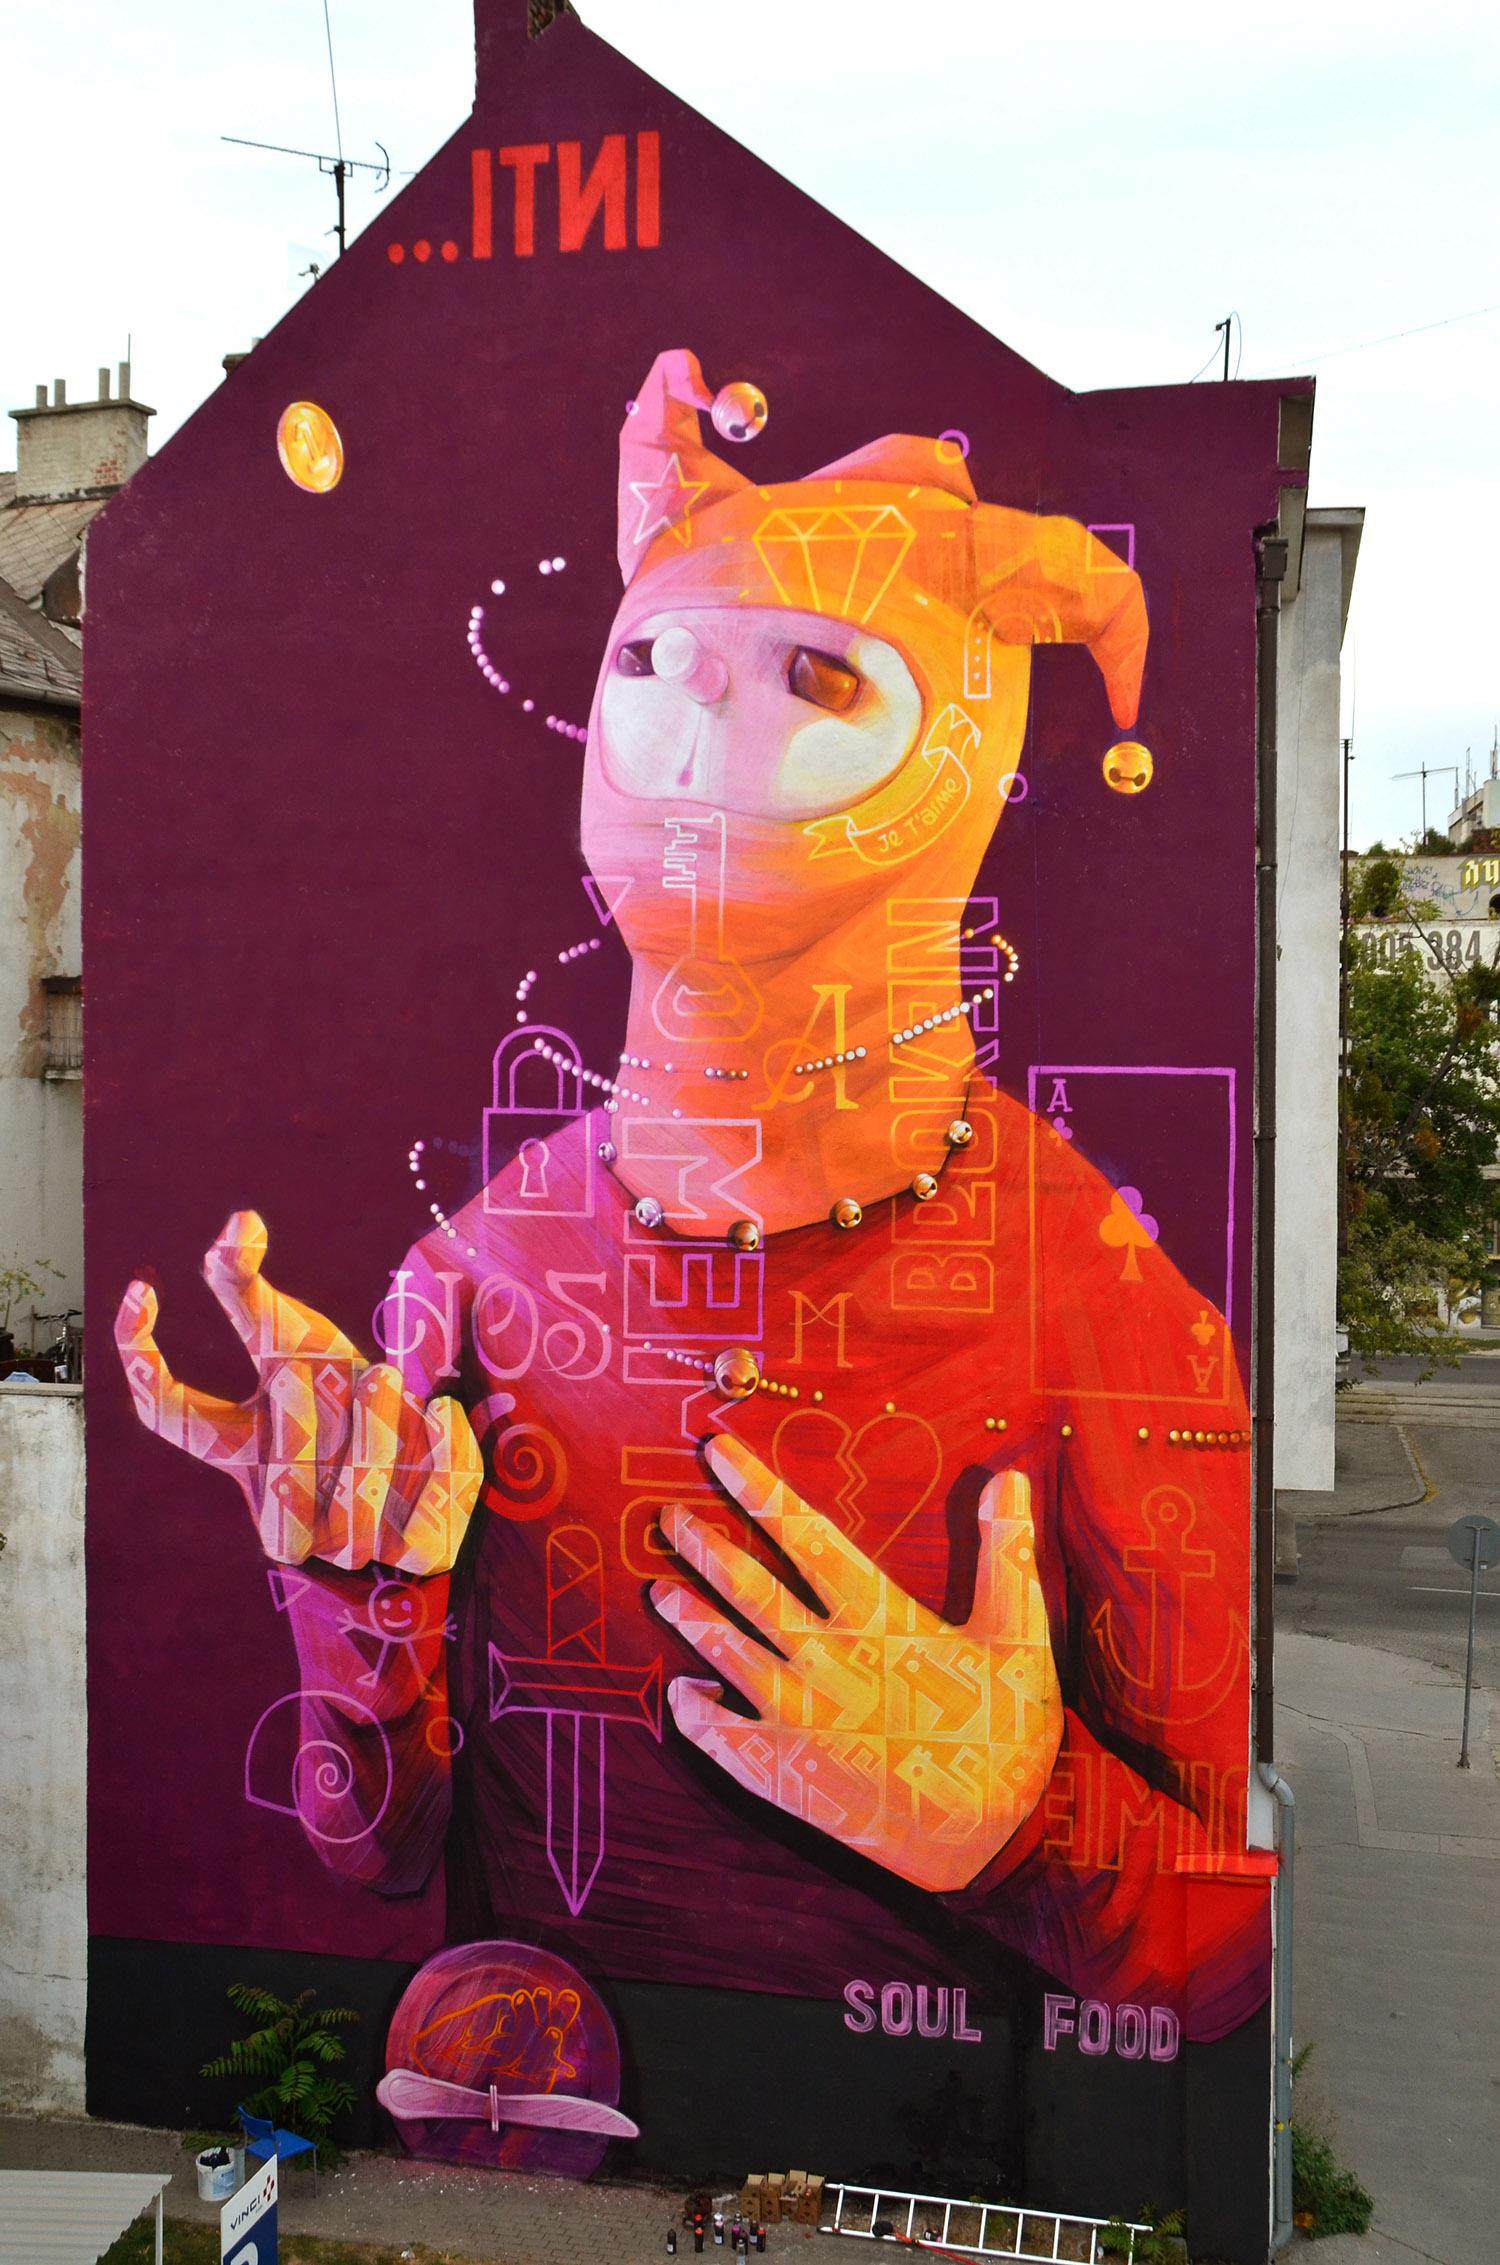 0_inti-graffiti-street-art_festival_streetart_comunication_kosice_slovakia_2013